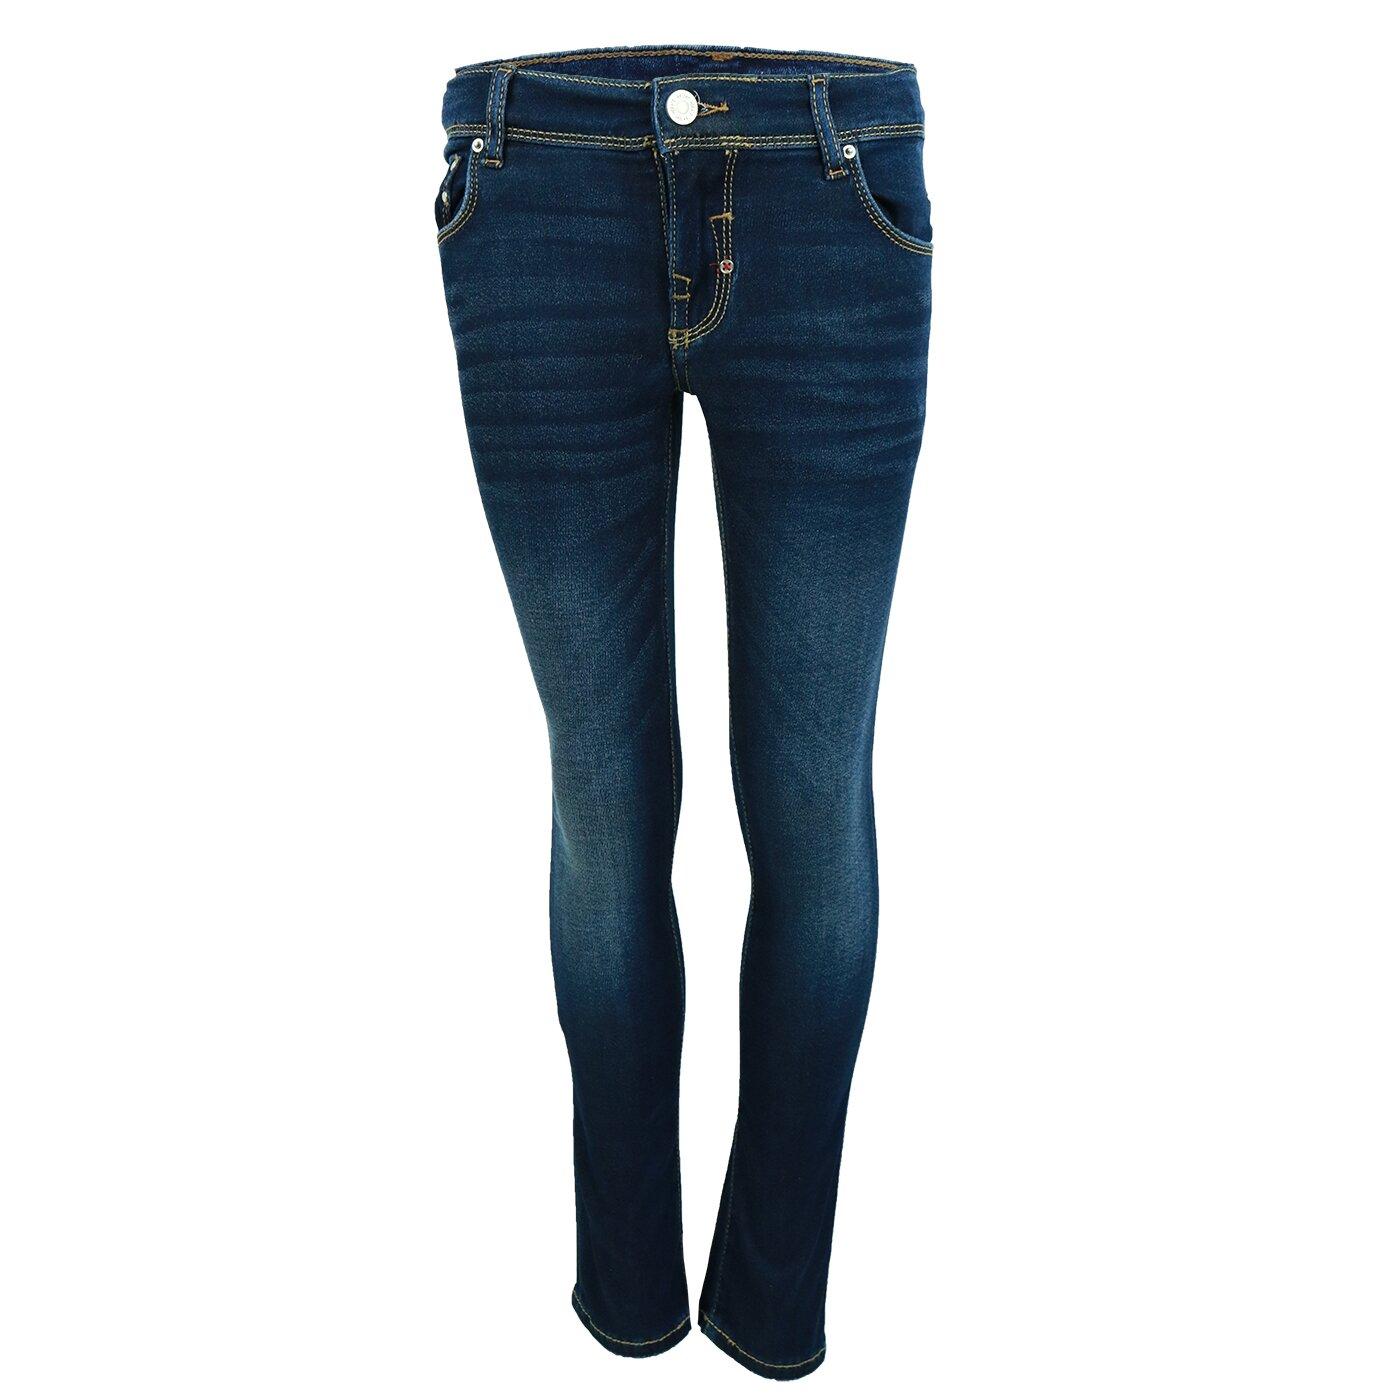 Antony Morato Fighetto Jeans 0230